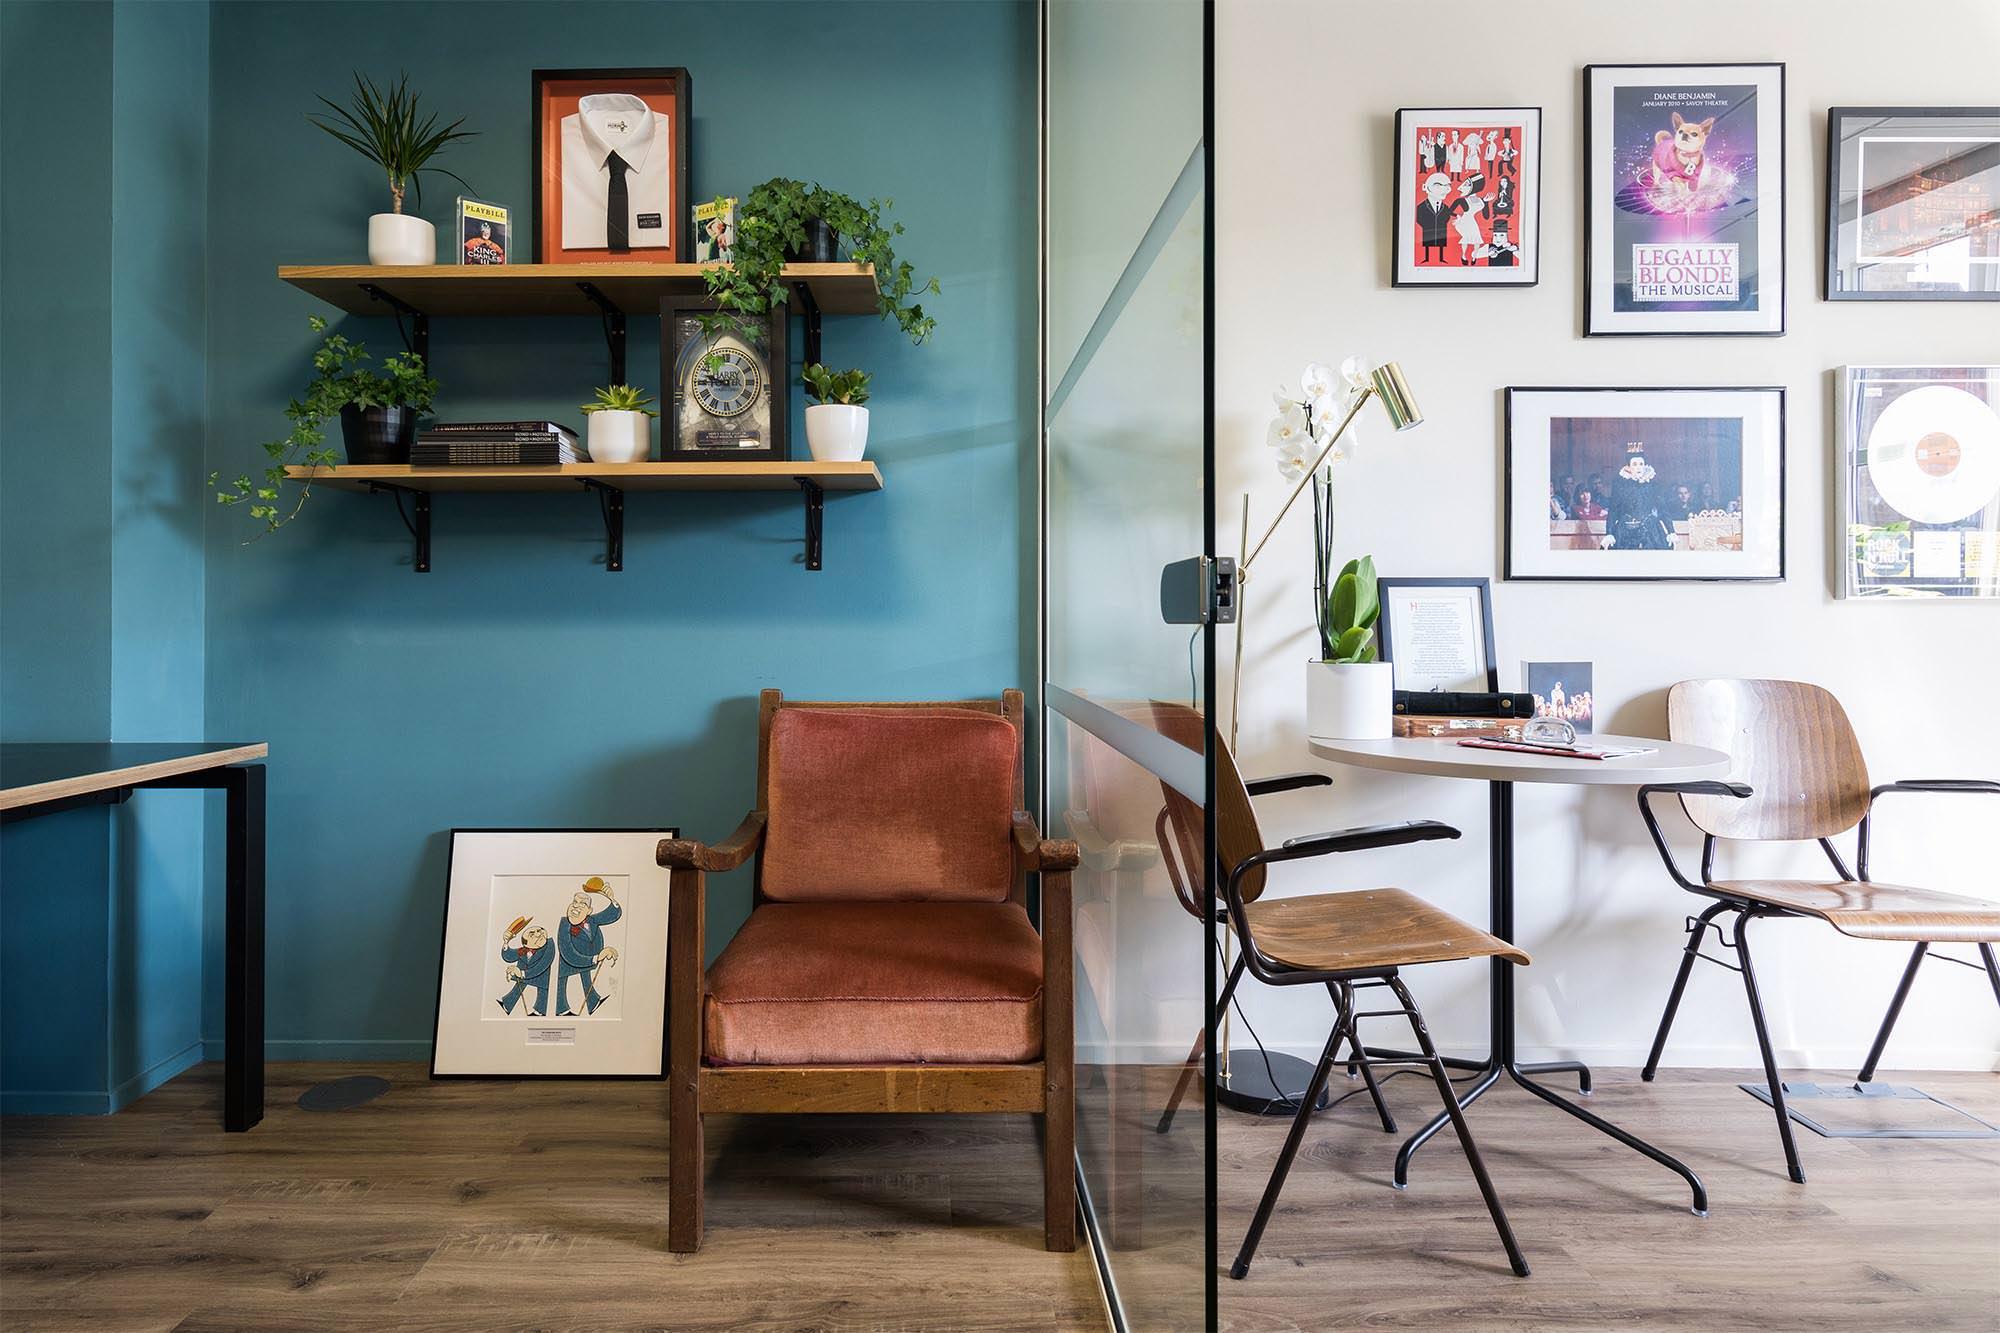 trifle-office-design-sonia-friedman-2.jpg